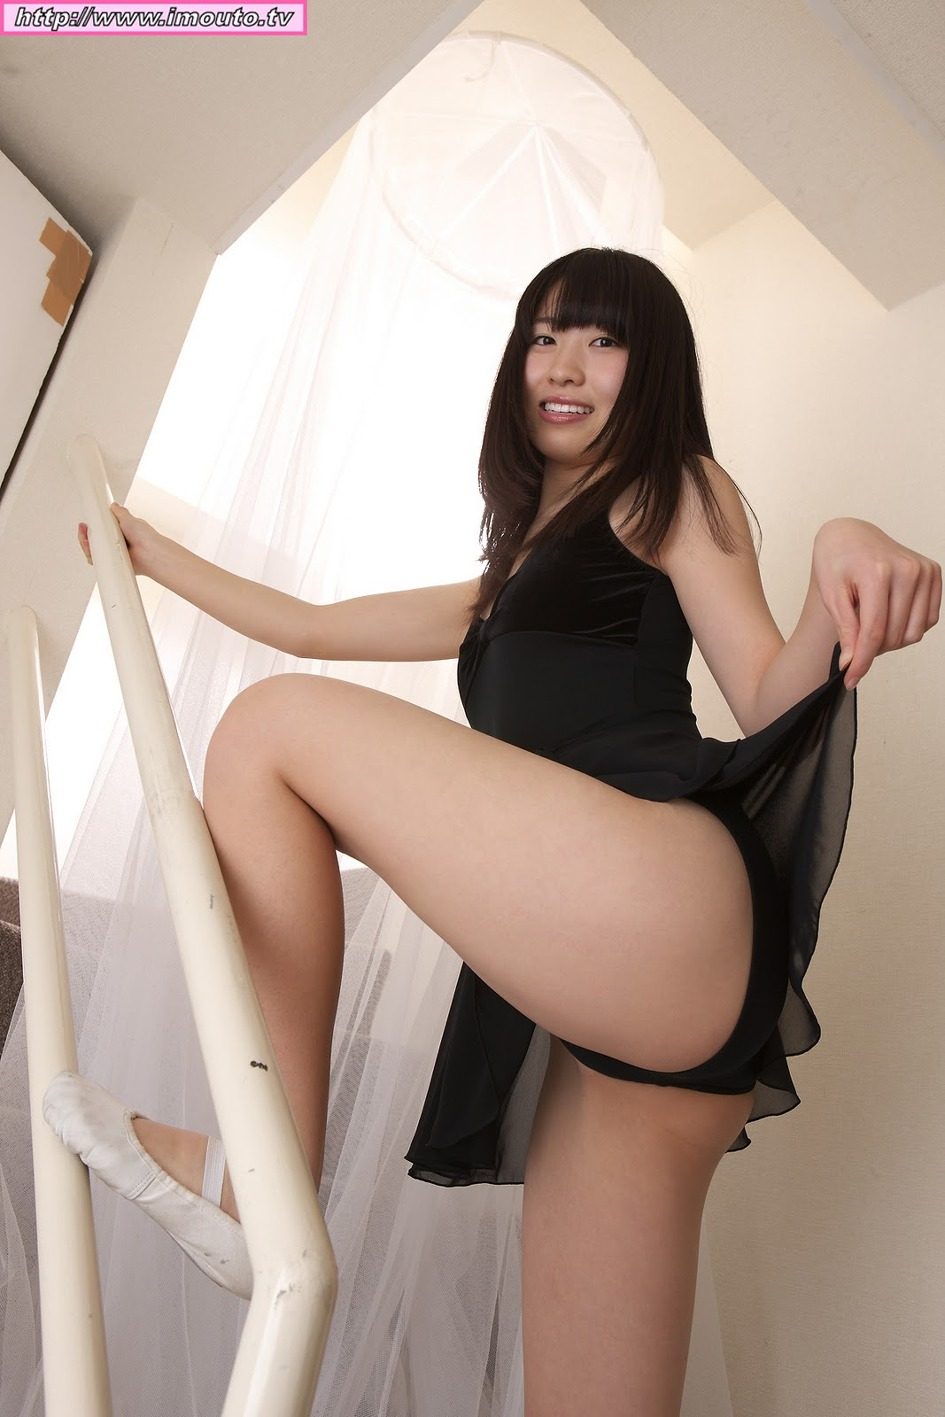 hitomi_ogata imouto.tv http://blog.daum.net/ssddddd/17123764